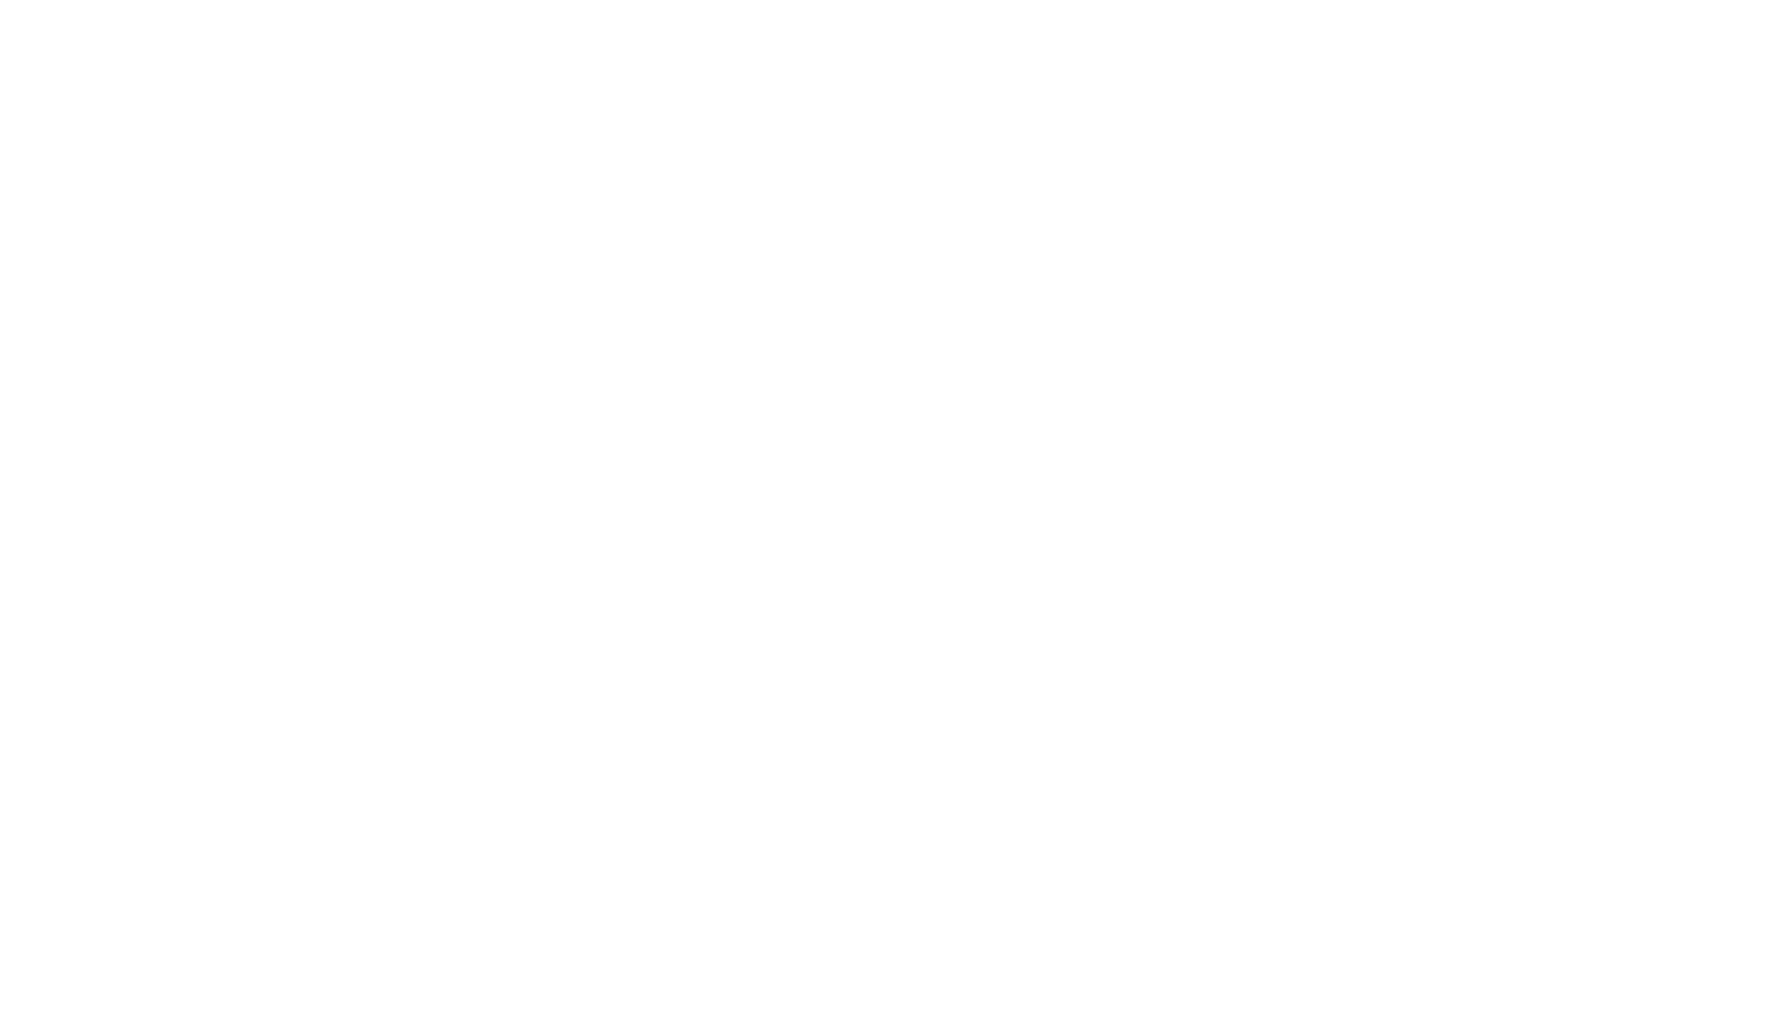 TAS_LogoLockup_Revised_01_White.png